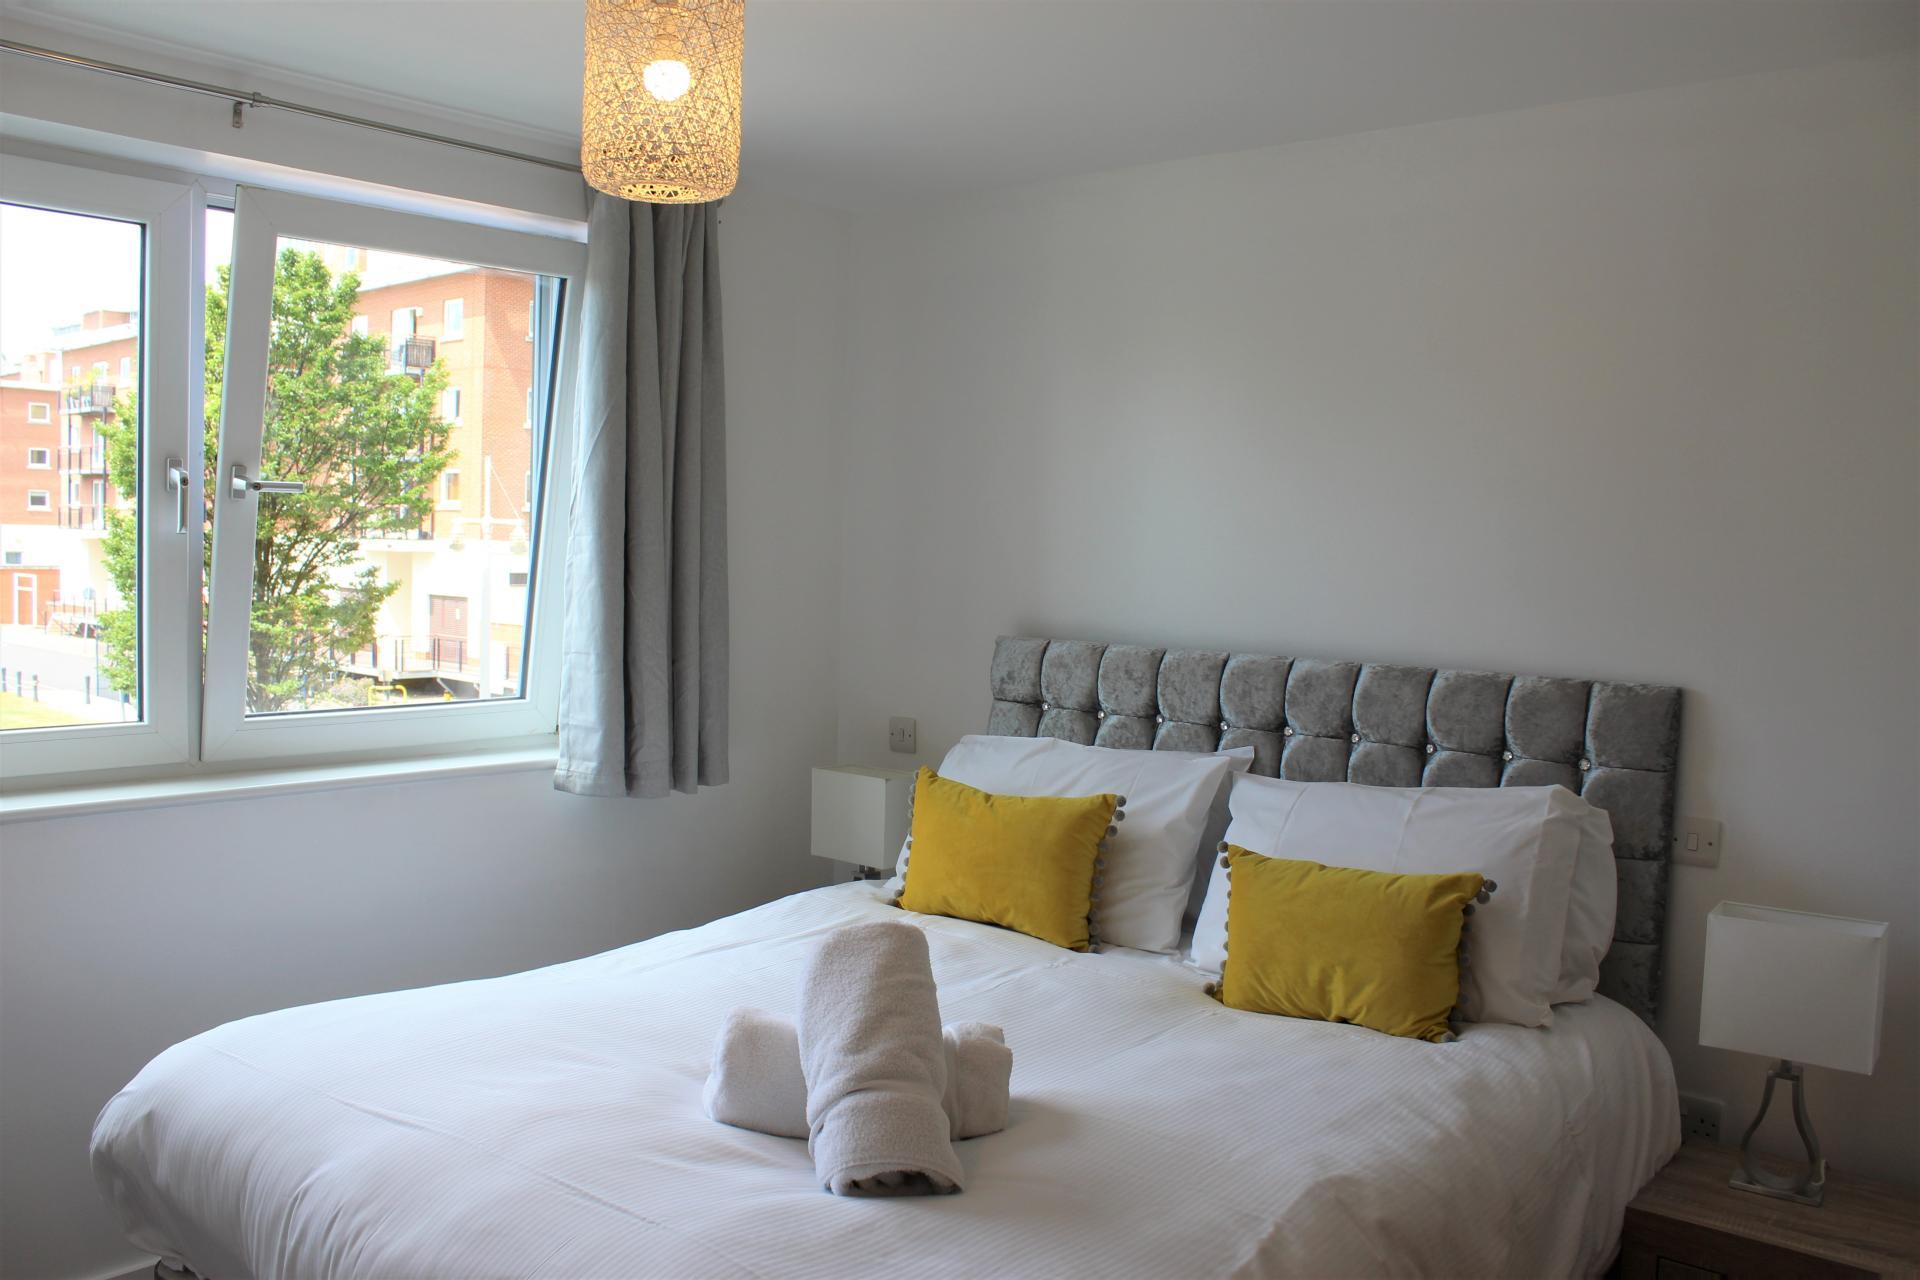 Towels at Gunwharf Quays Apartments, Gunwharf Quays, Portsmouth - Citybase Apartments